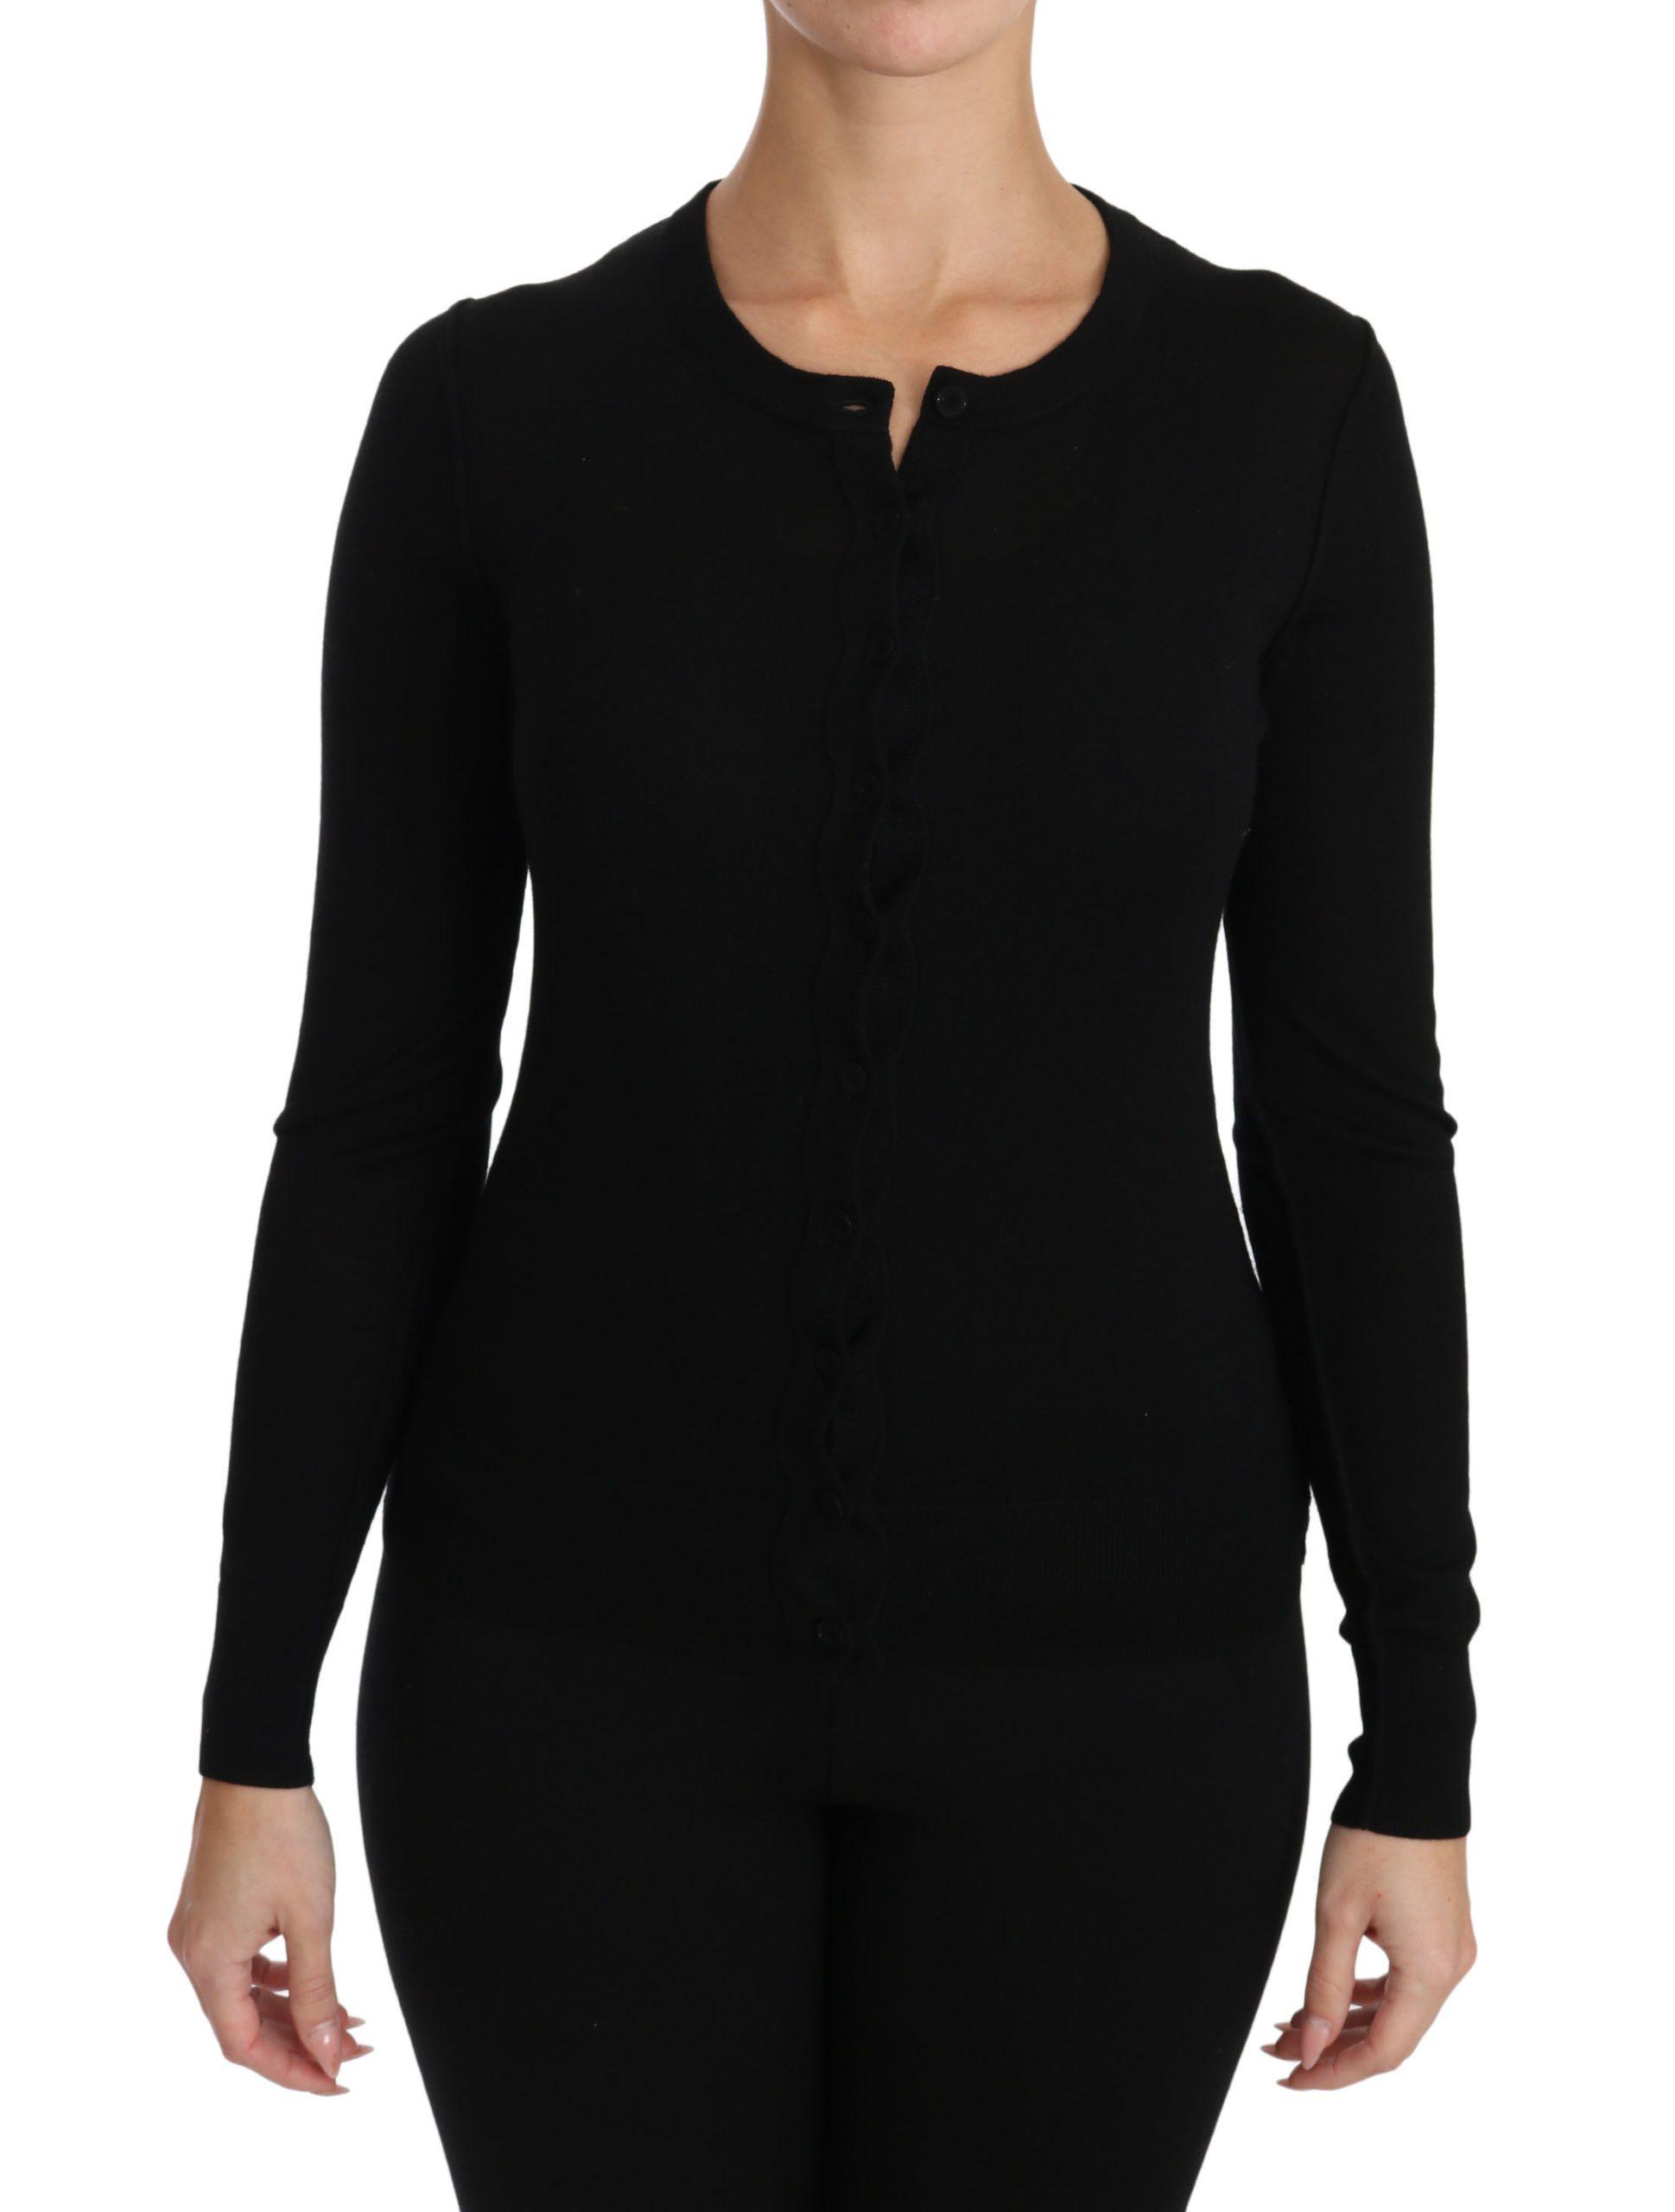 Dolce & Gabbana Women's Button Wool Cardigan Black TSH3027 - IT40|S